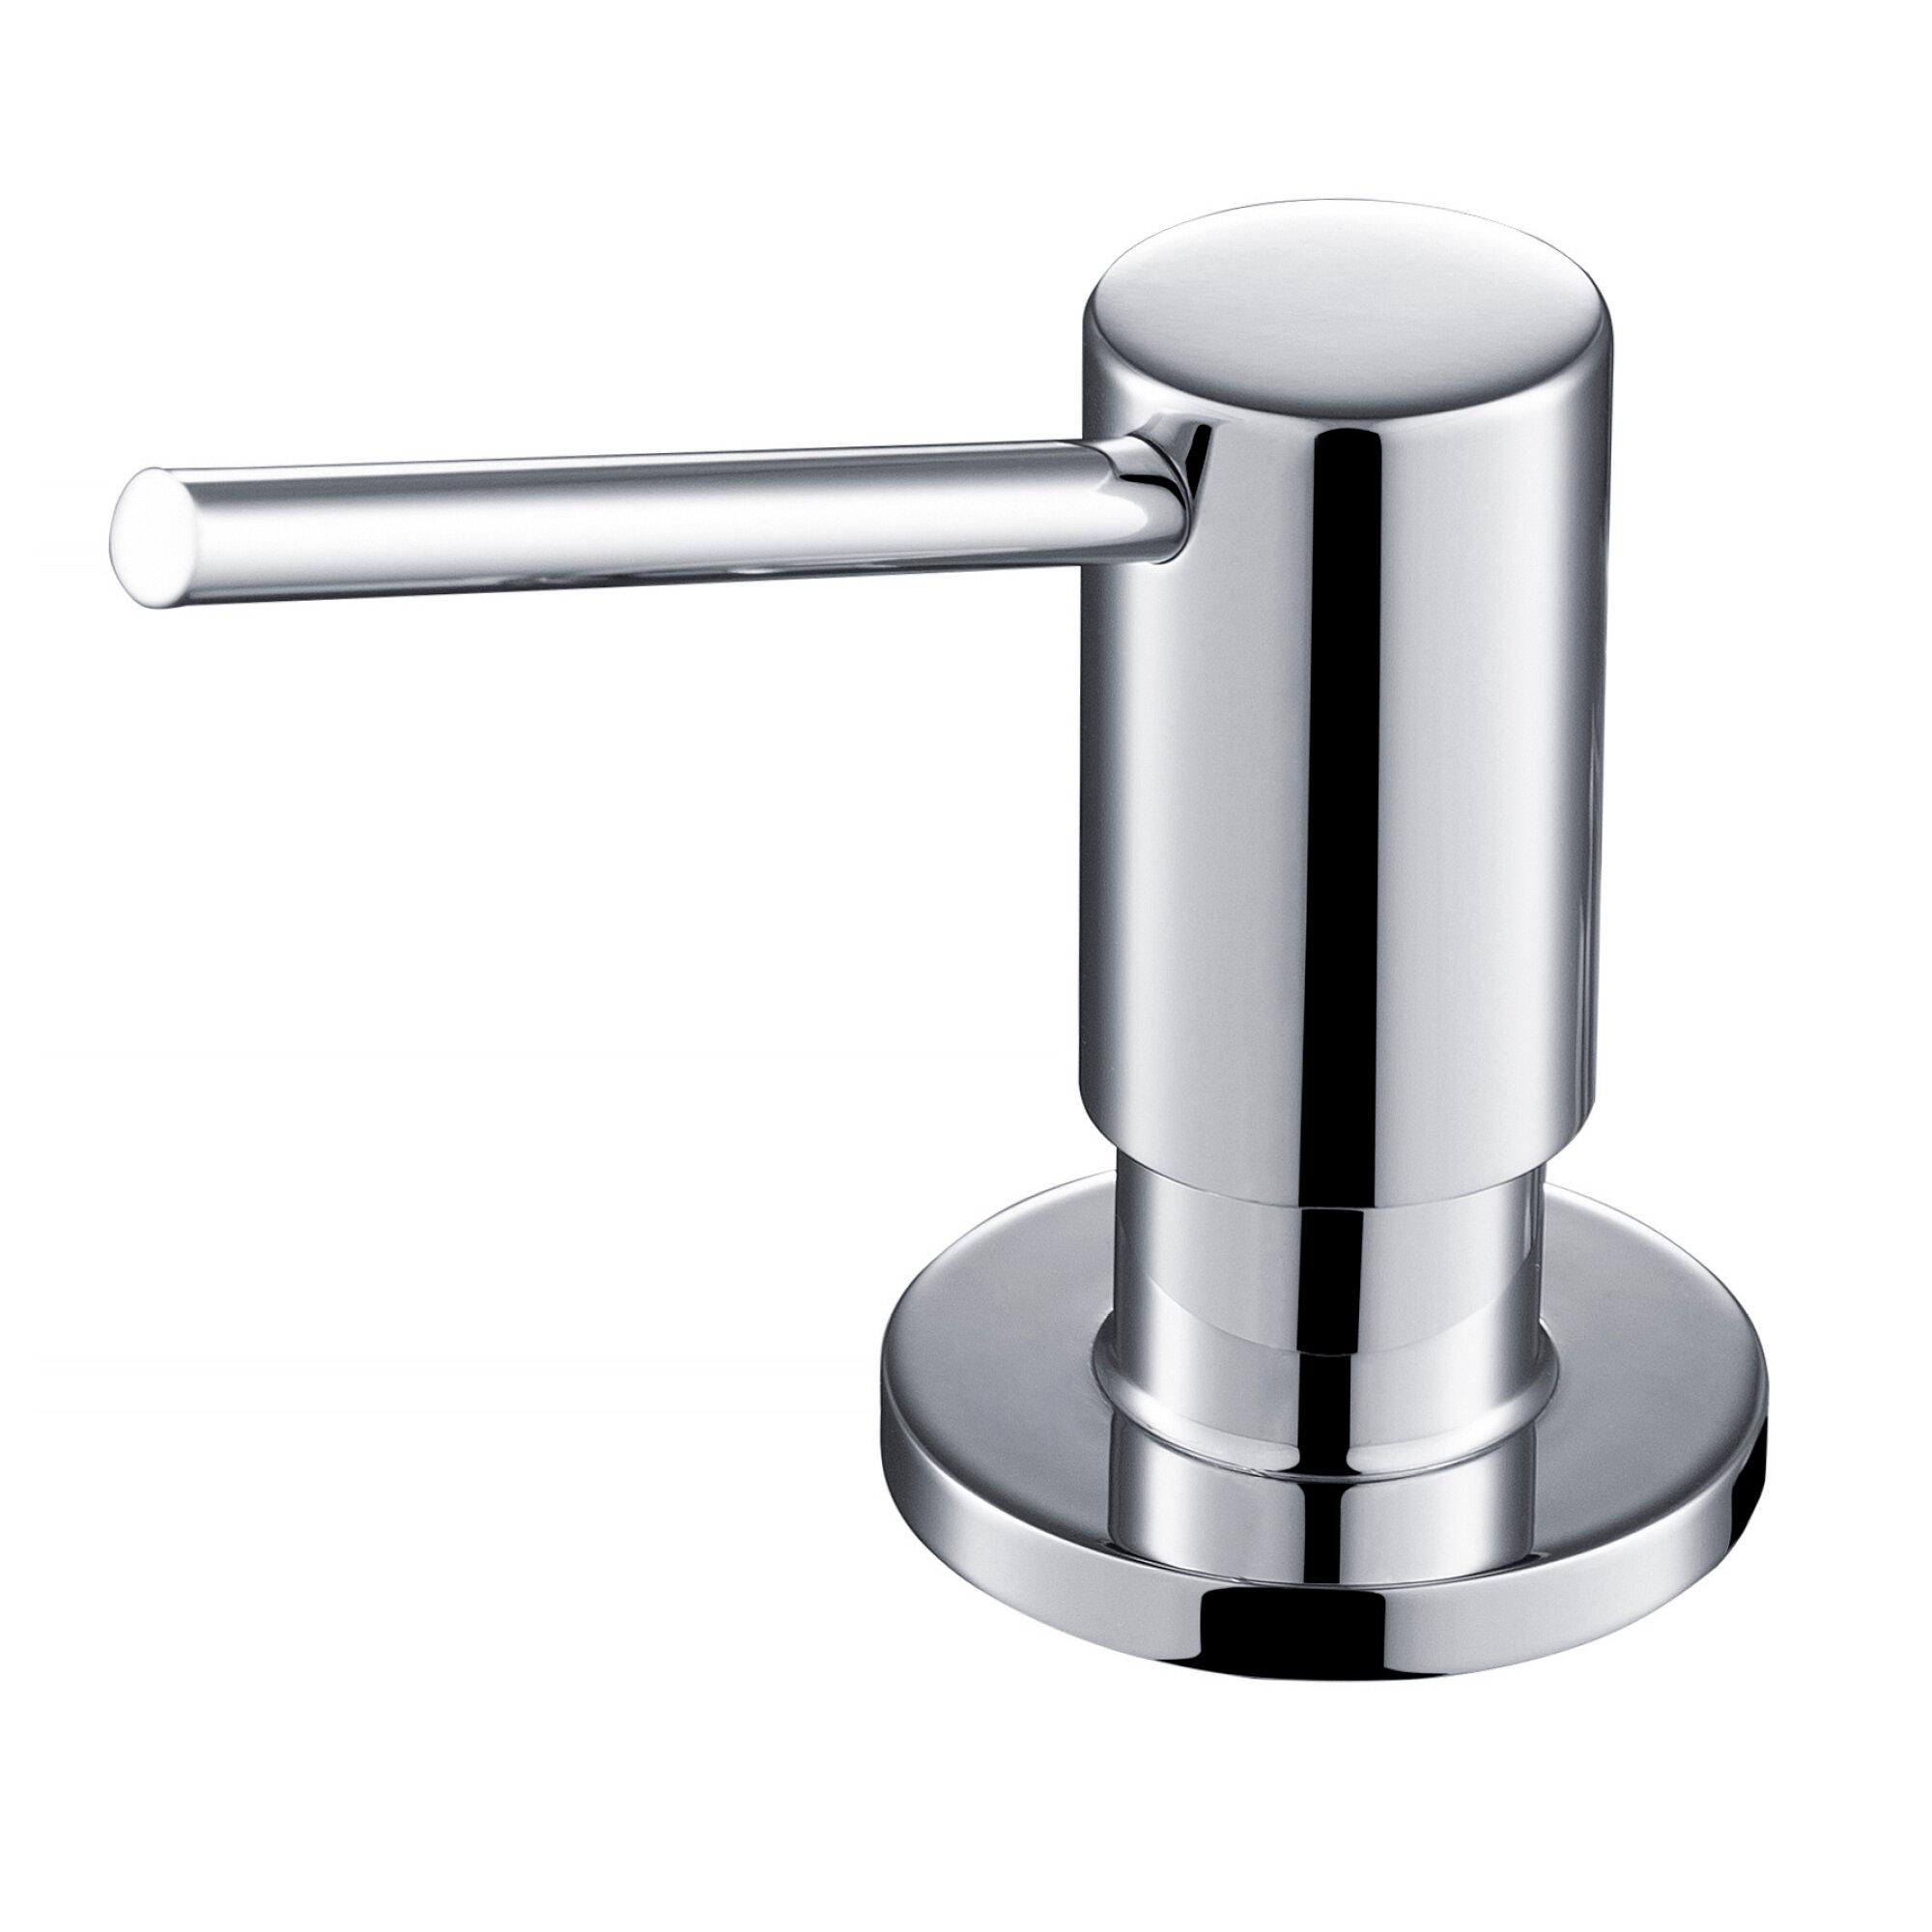 Kitchen Lotion Soap Dispenser